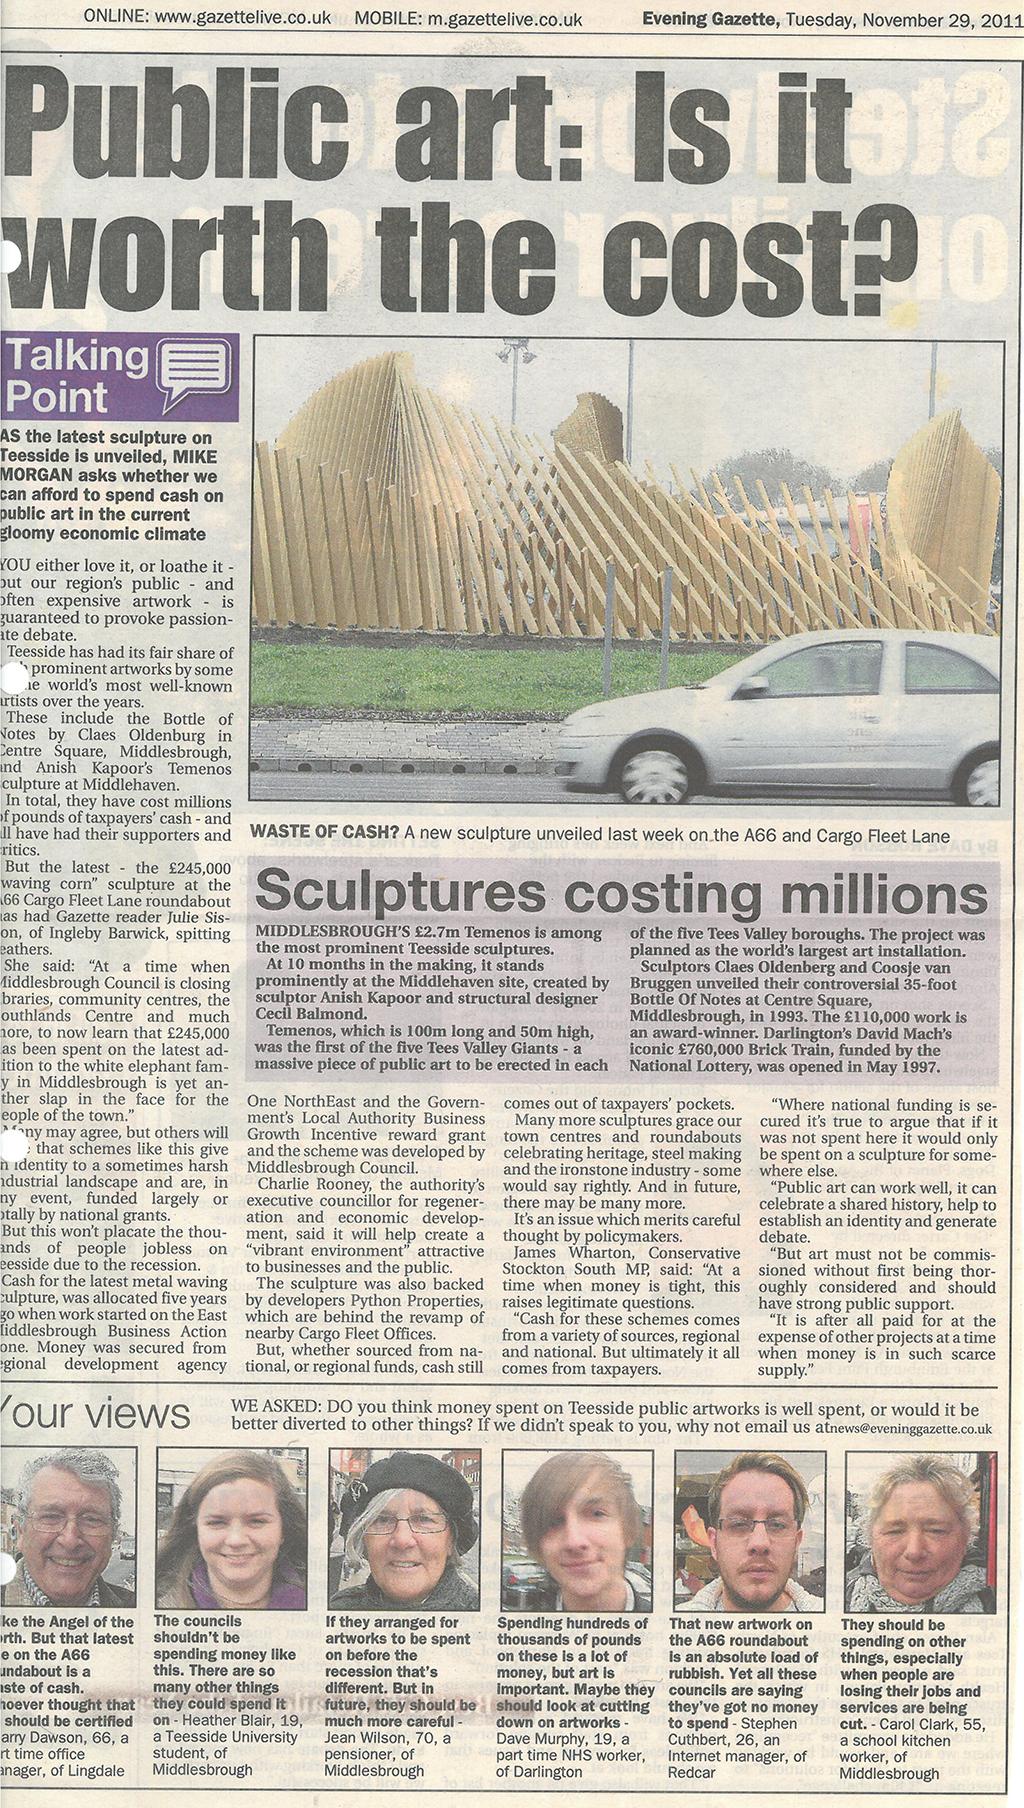 2011-11-29, Evening Gazette1